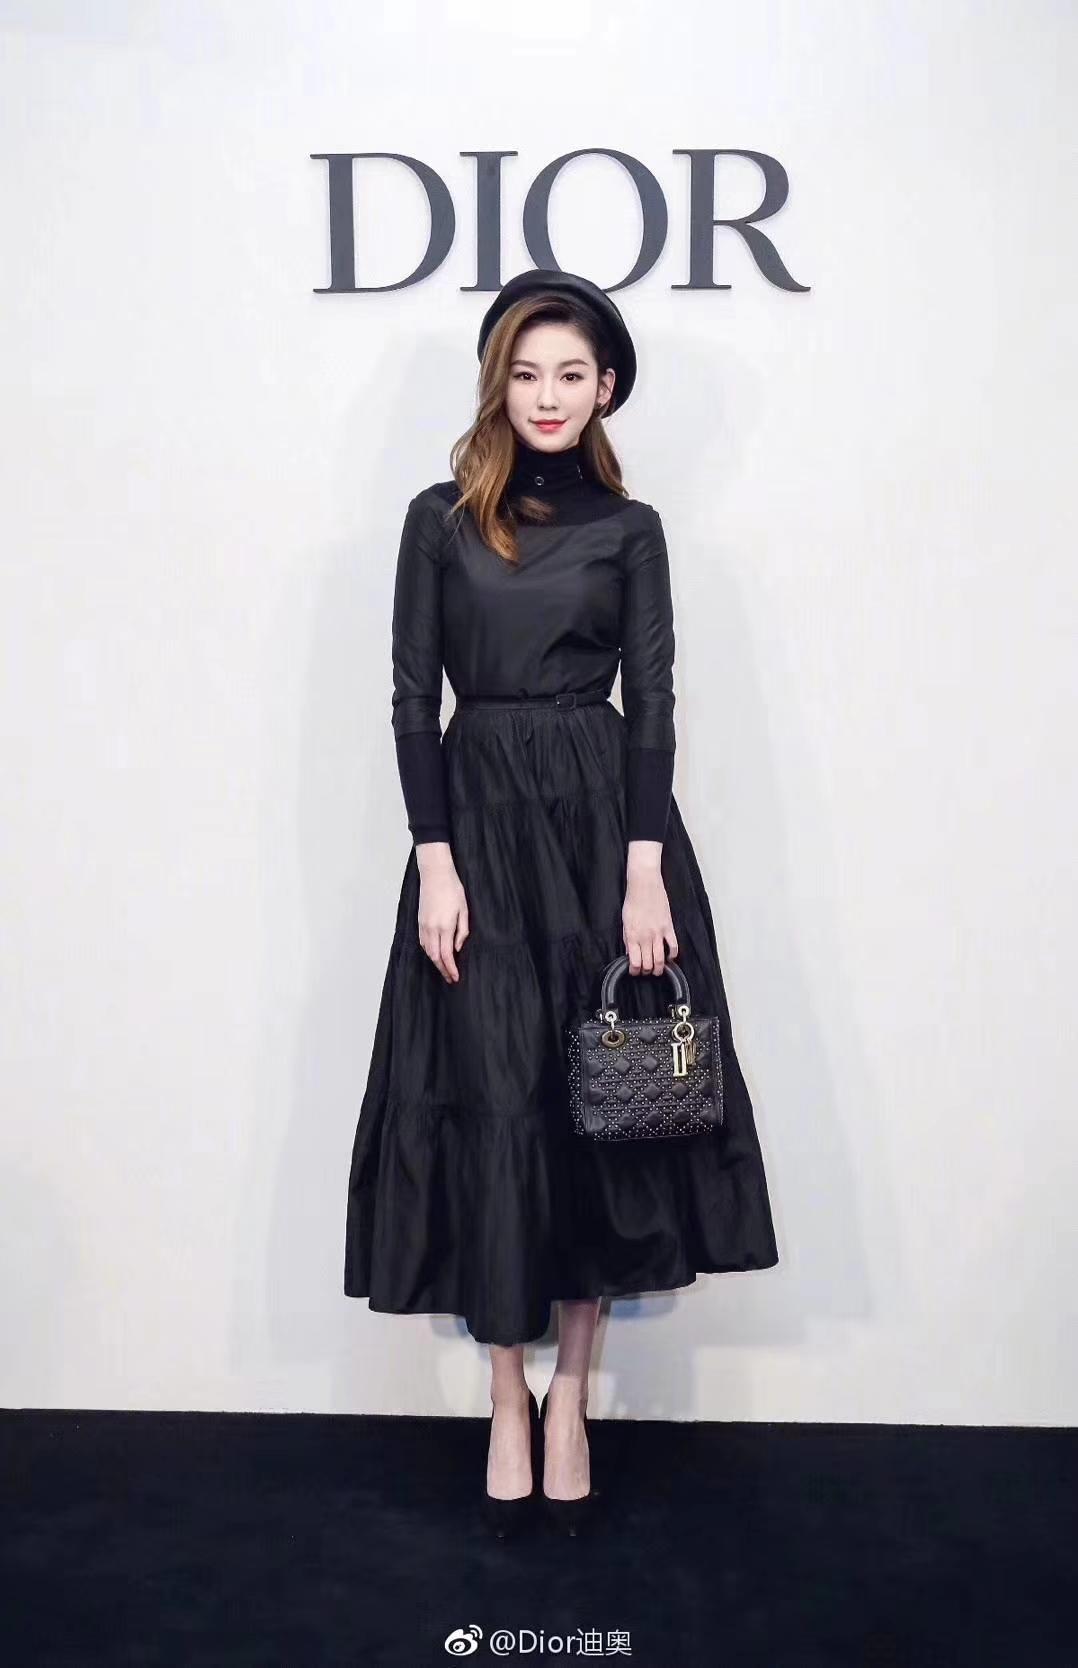 Dior 迪奥 三格 17cm 黑色复古风牛皮铆钉包